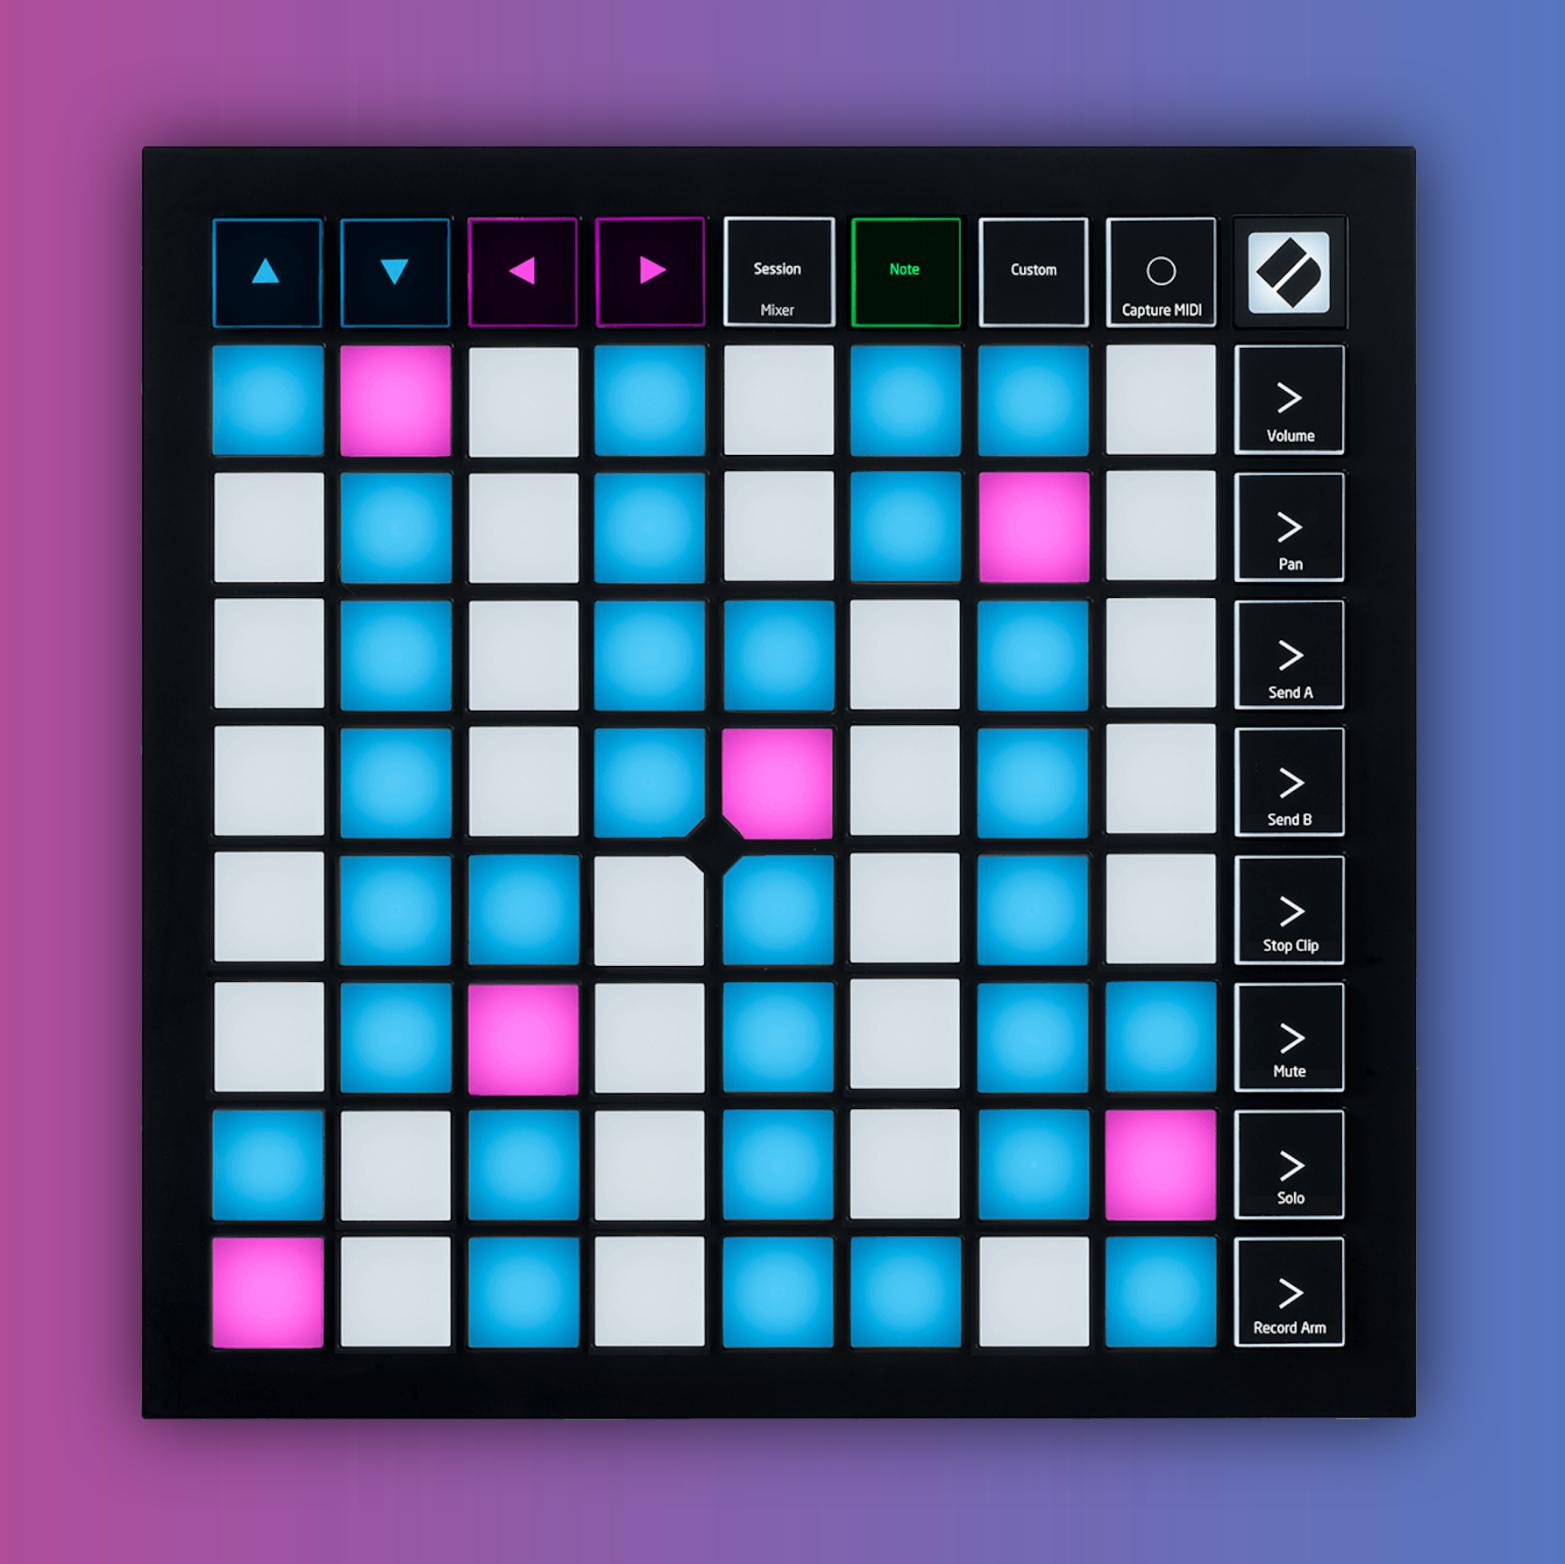 Novation Launchpad X: DAW-Controller (64 RGB Pads, 16 Tasten, 4 Modi, MIDI In-/Out)